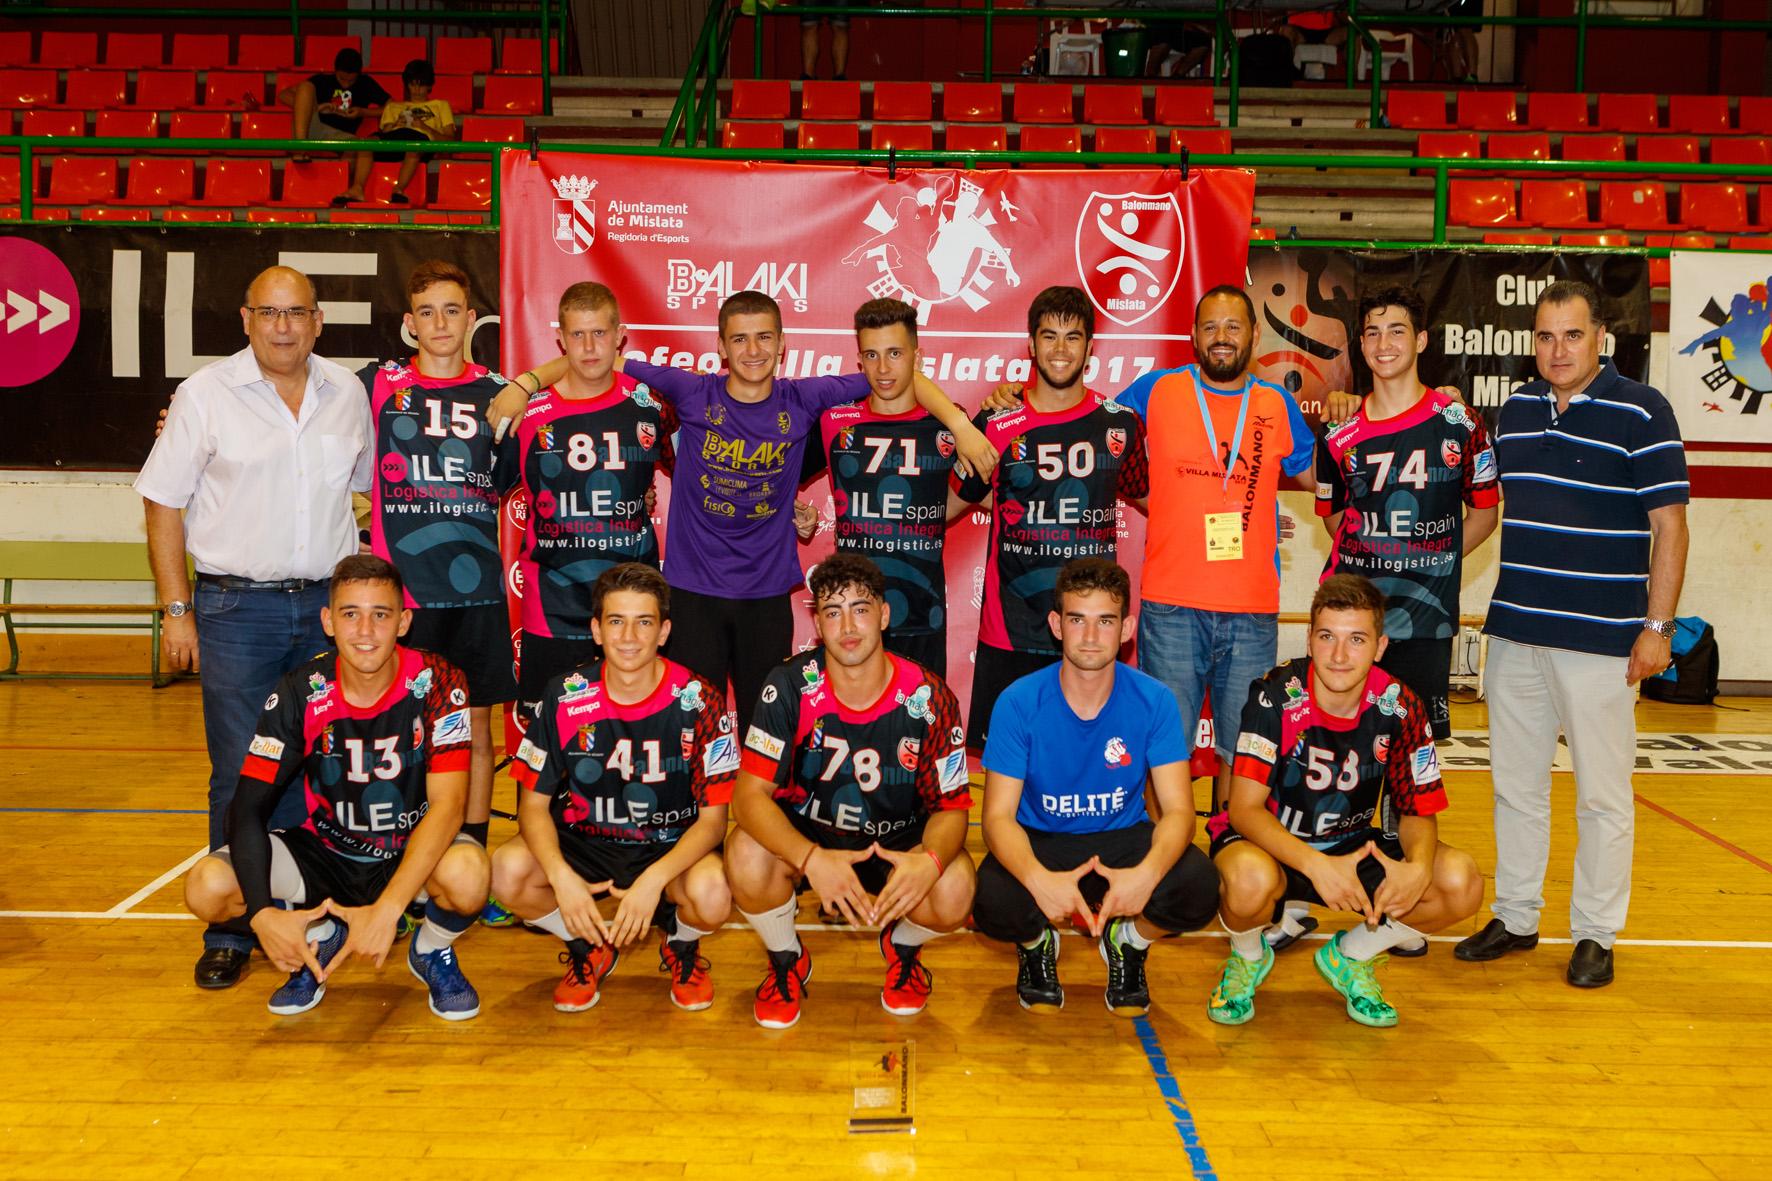 trofeo-de-balonmano-villa-de-mislata-2017-8